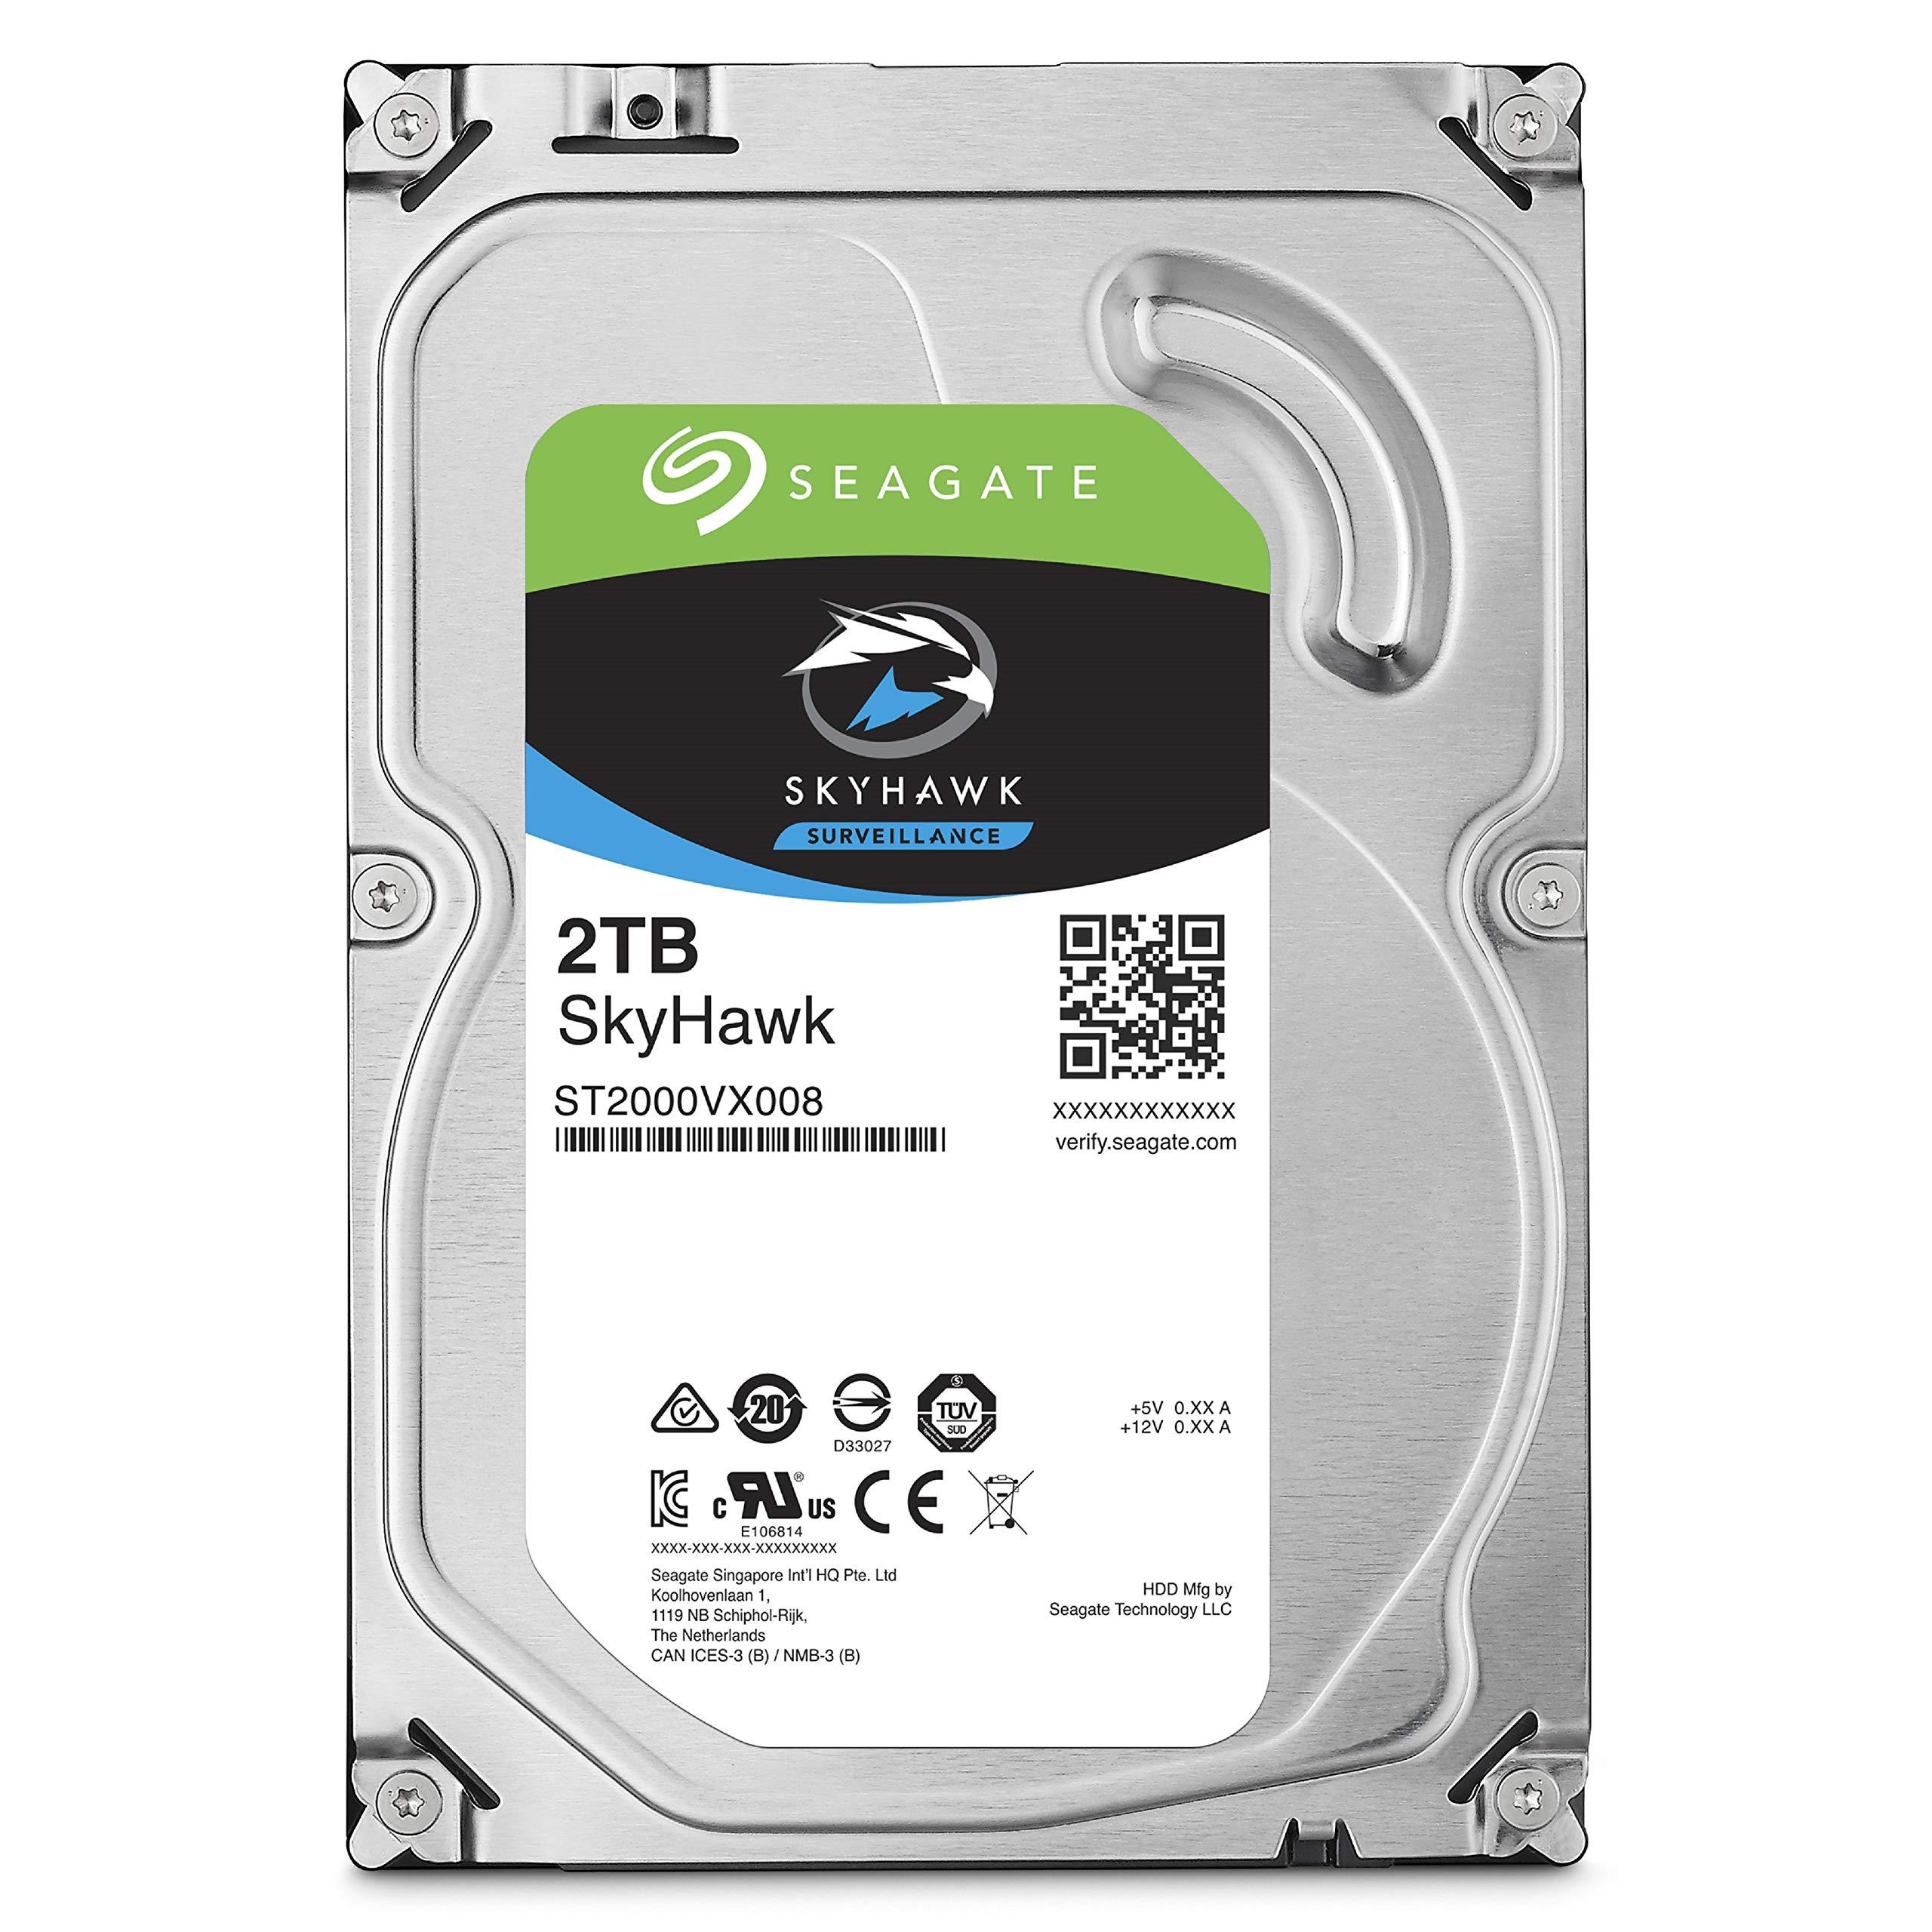 Seagate SkyHawk 2TB Surveillance Hard Drive - SATA 6Gb/s 64MB Cache 3.5-Inch Internal Drive (ST2000VX008)